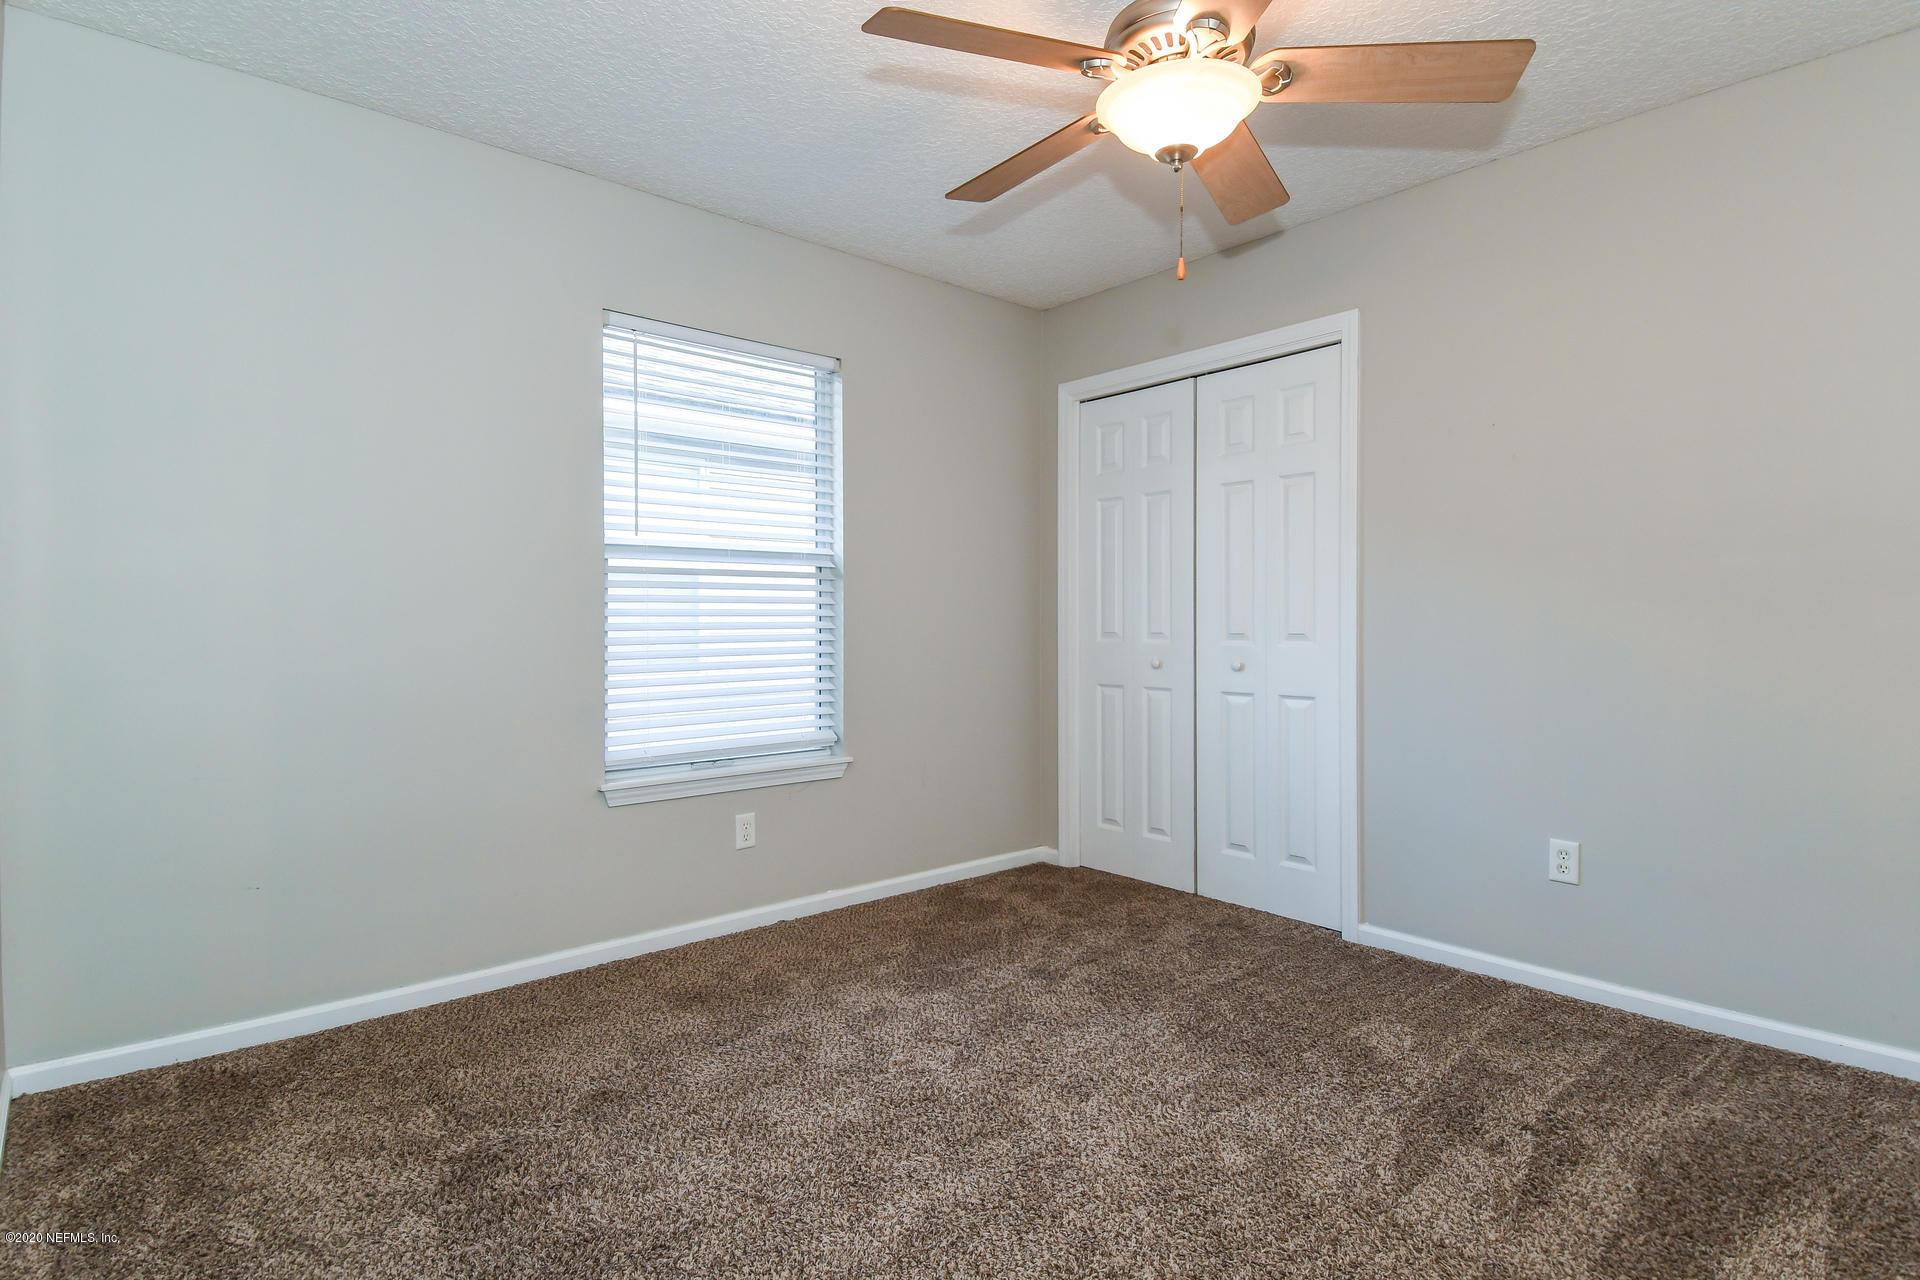 848 MACKENZIE, ST AUGUSTINE, FLORIDA 32092, 3 Bedrooms Bedrooms, ,2 BathroomsBathrooms,Rental,For Rent,MACKENZIE,1081286